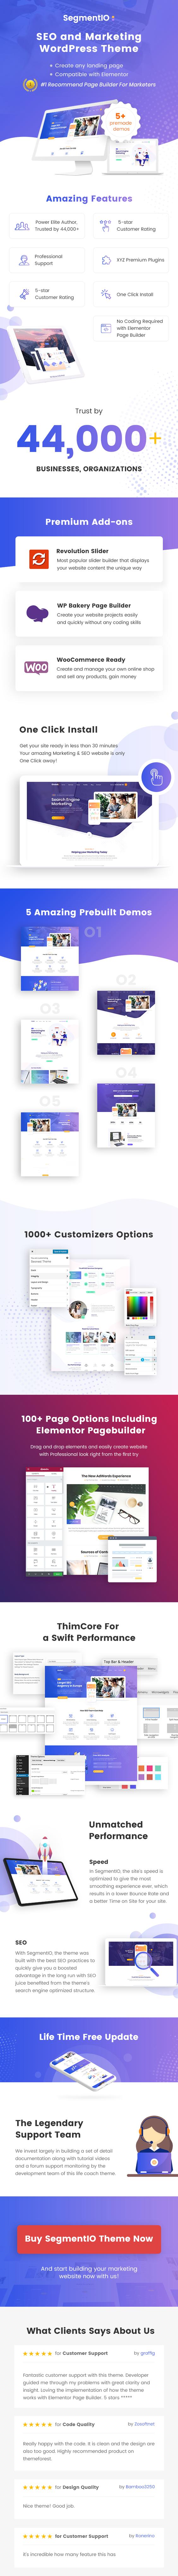 SEOnest - Marketing WordPress Theme - 1